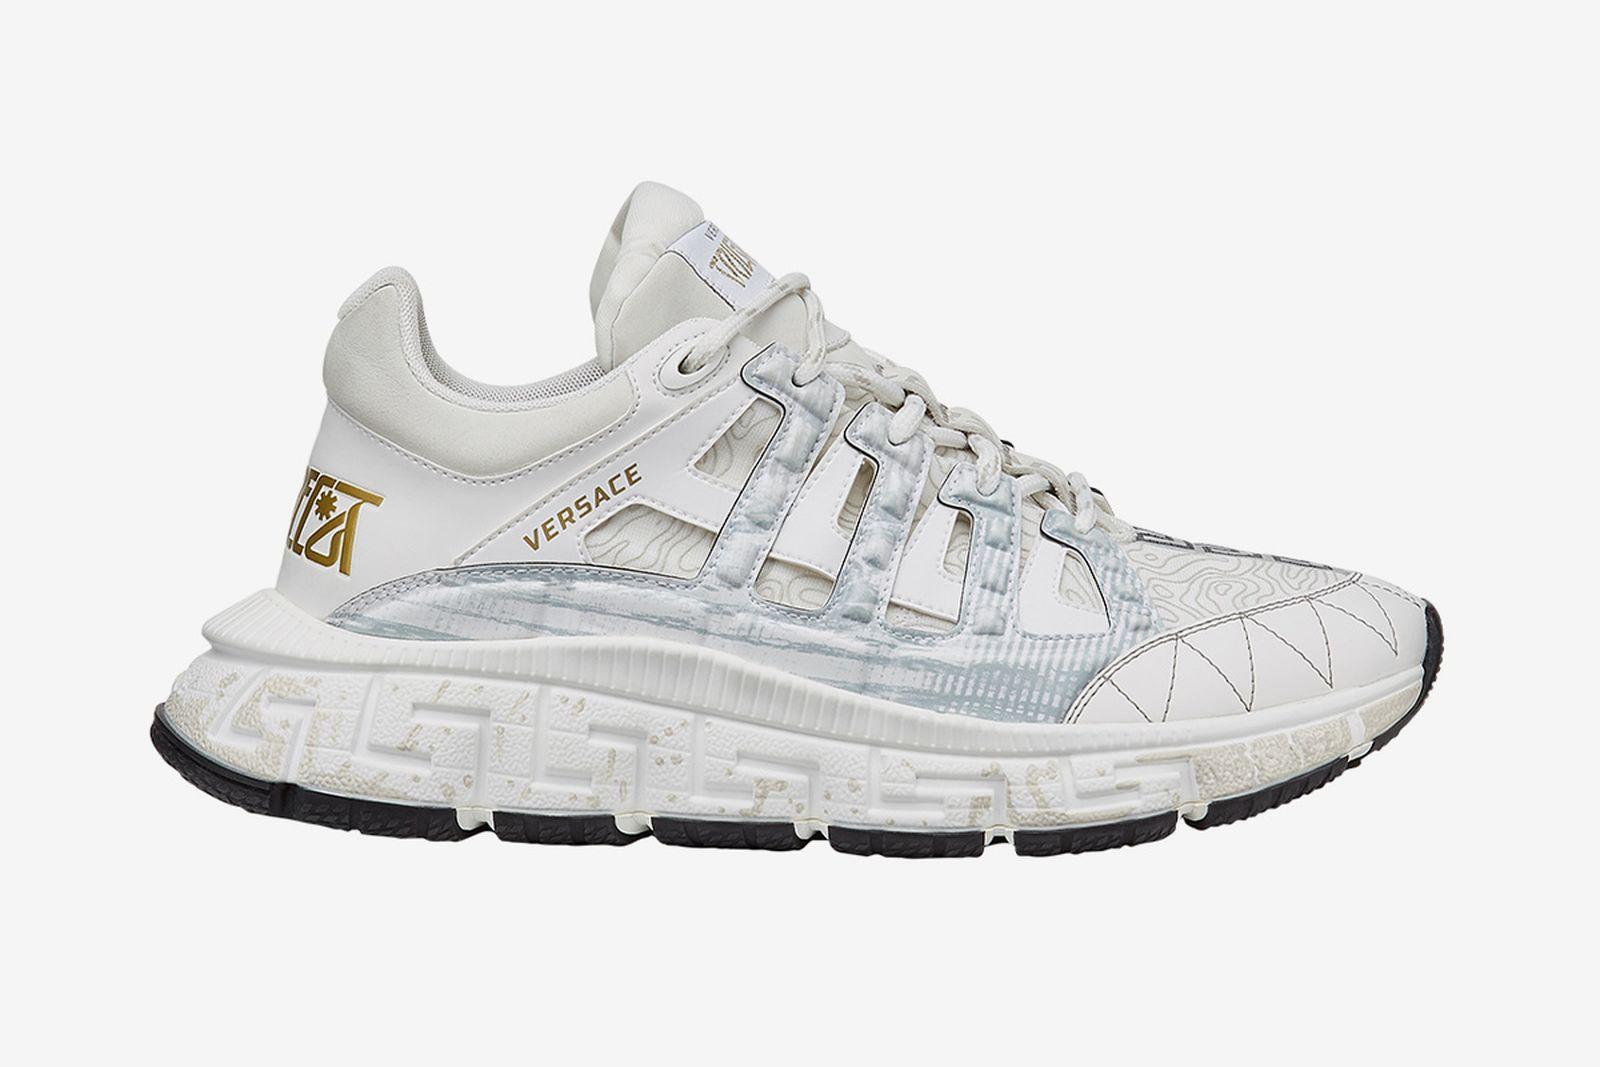 versace-trigreca-sneaker-release-date-price-04